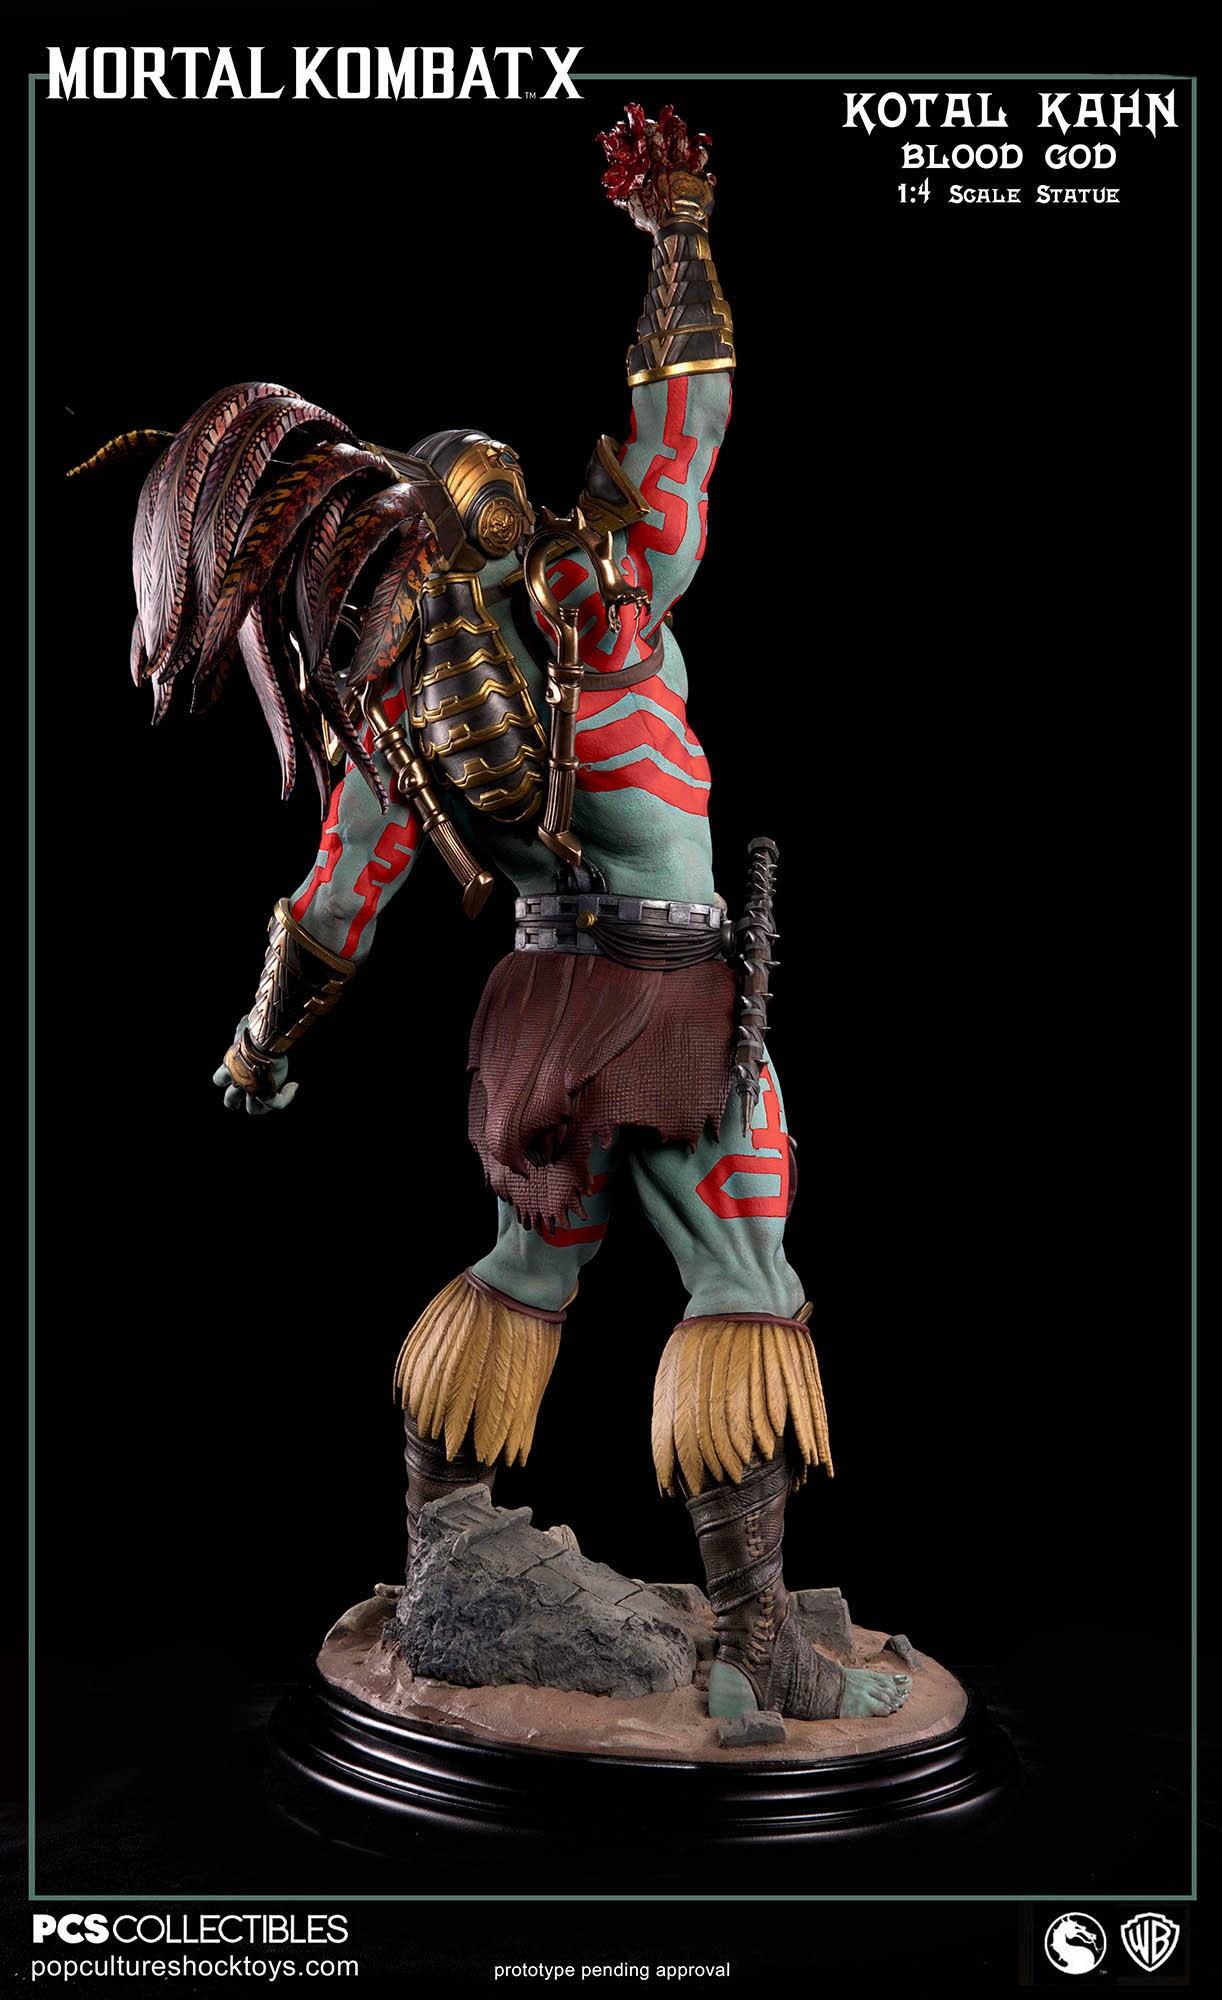 [Pop Culture Shock] Mortal Kombat X: Kotal Kahn 1:4 scale PCS-Kotal-Kahn-Blood-God-006